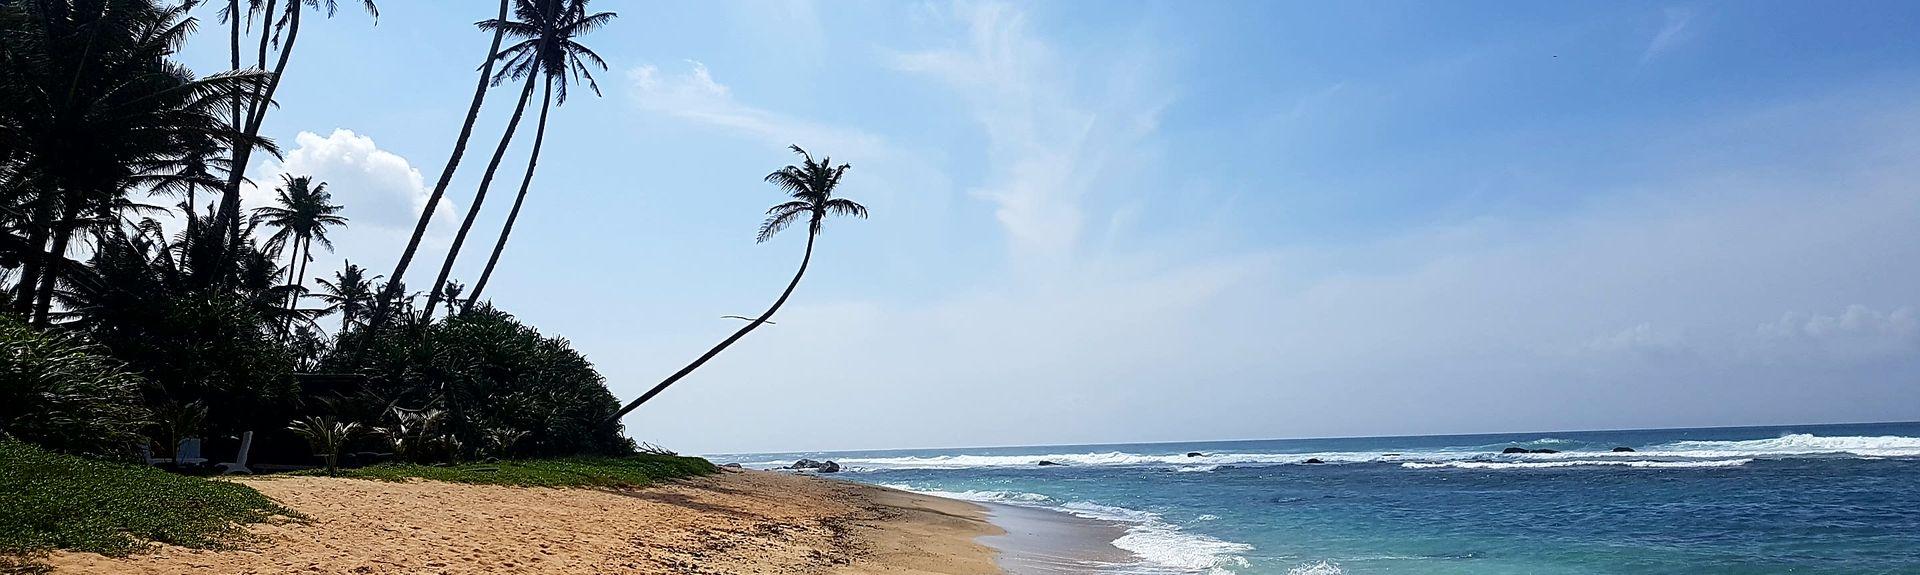 Parevi Duwa, Colombo, Sri Lanka